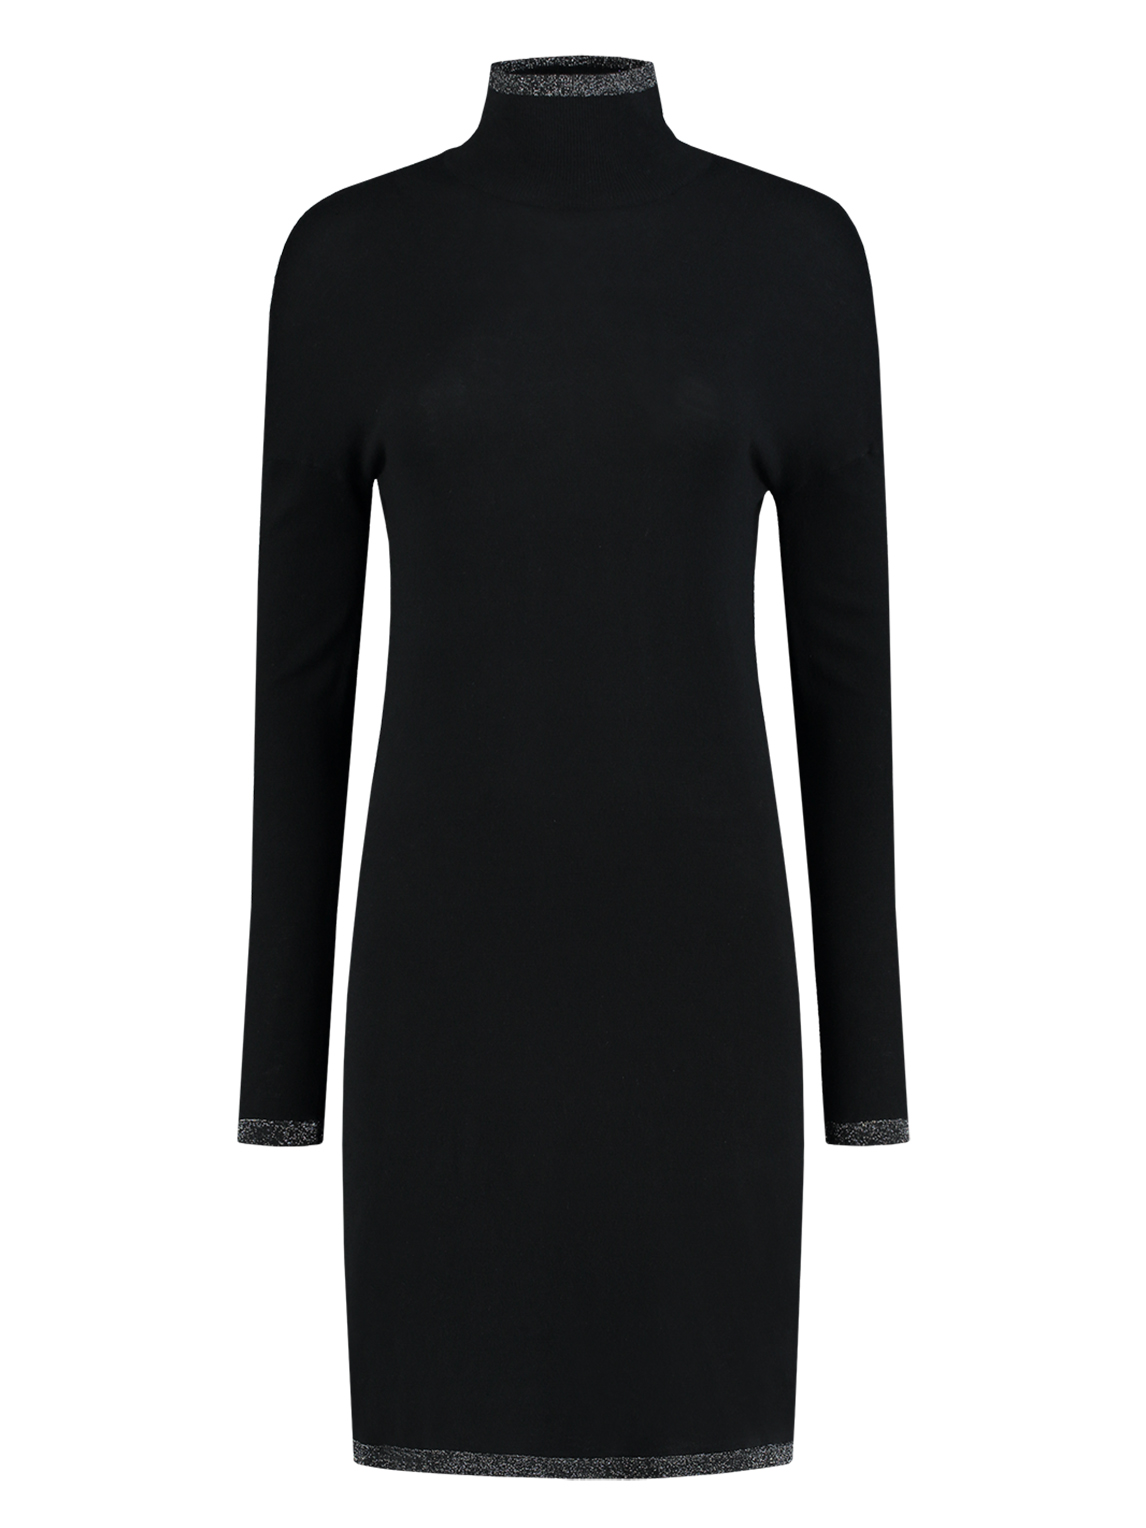 Zwarte dames jurk met col Nikkie Jessa Turtle Neck Dress - N7-783 1901 9000